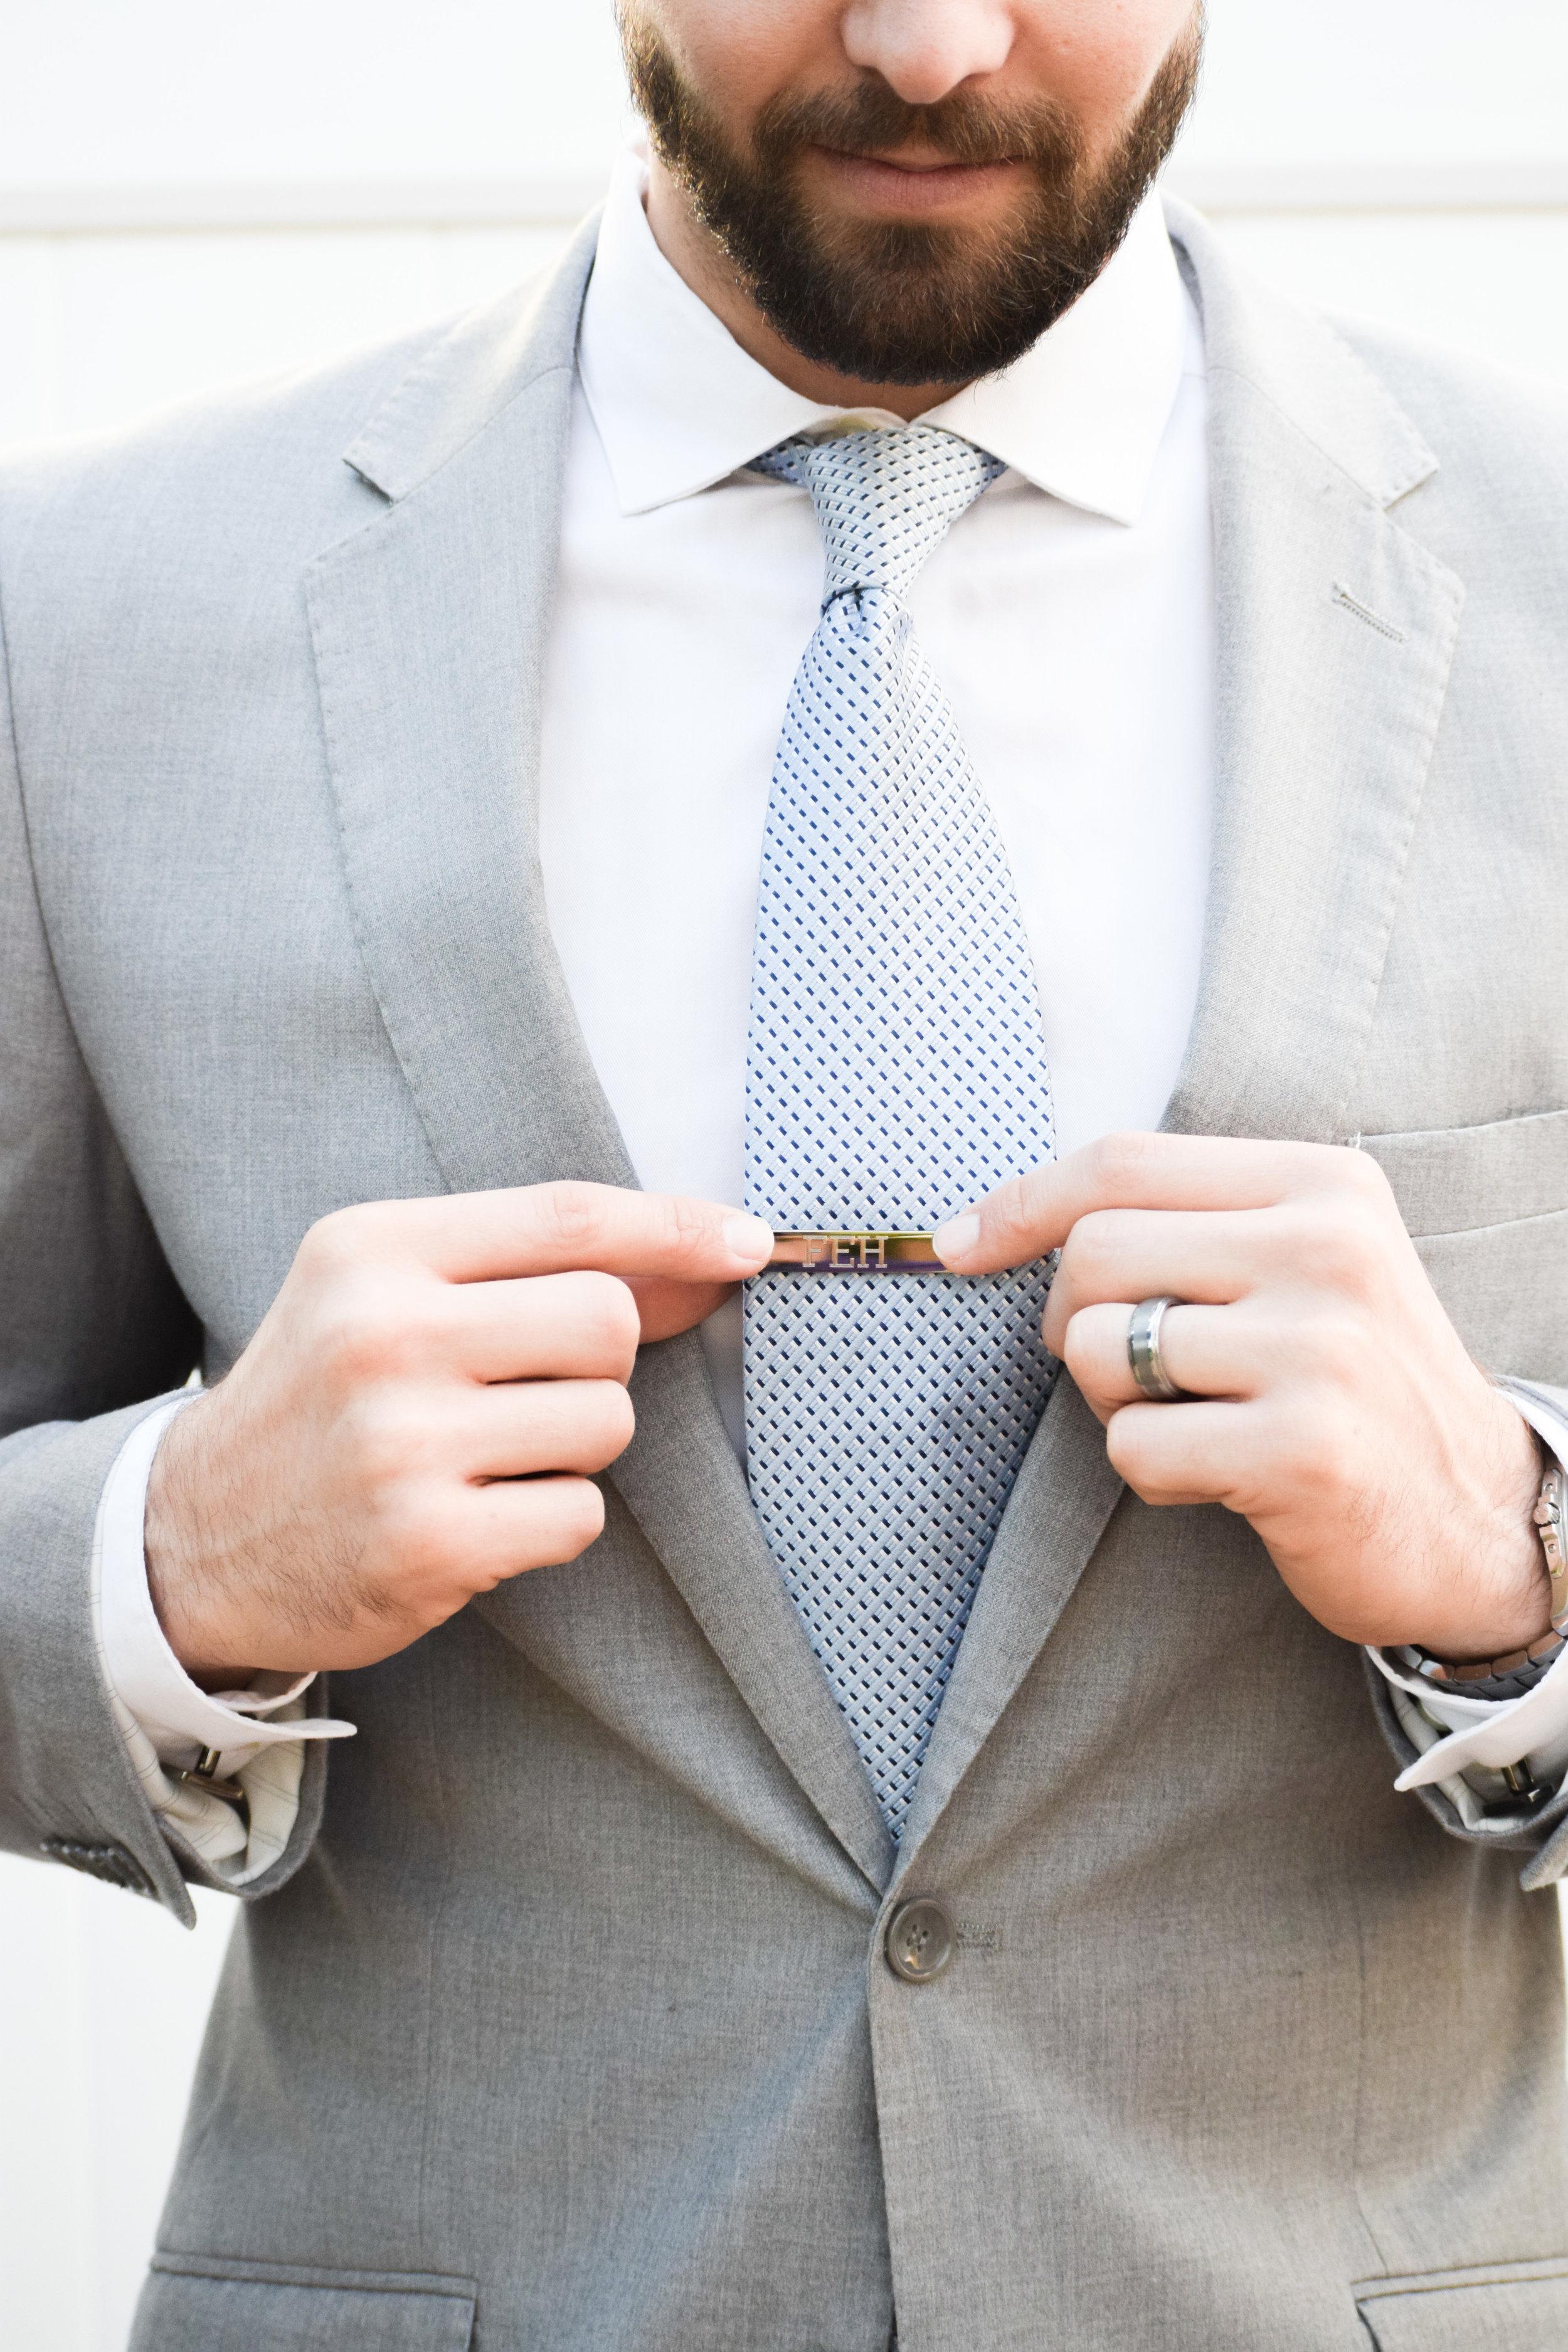 Groomsman Proposal Gift Ideas -- Engraved Groomsman Tie Clips - Things Remembered